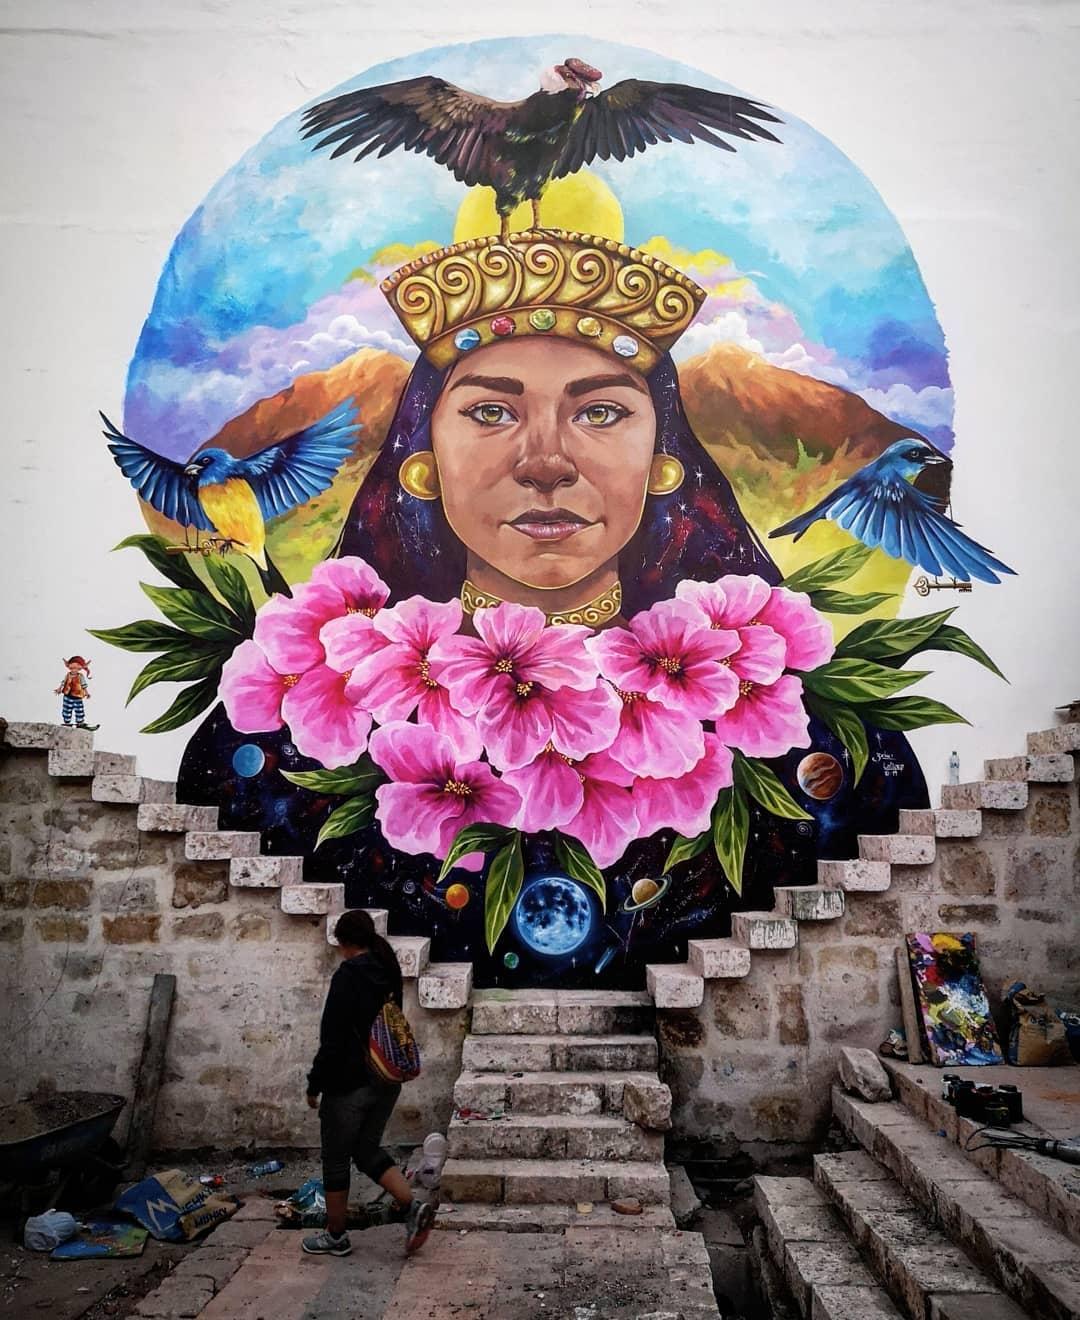 Zelva 1 @ Arequipa, Peru